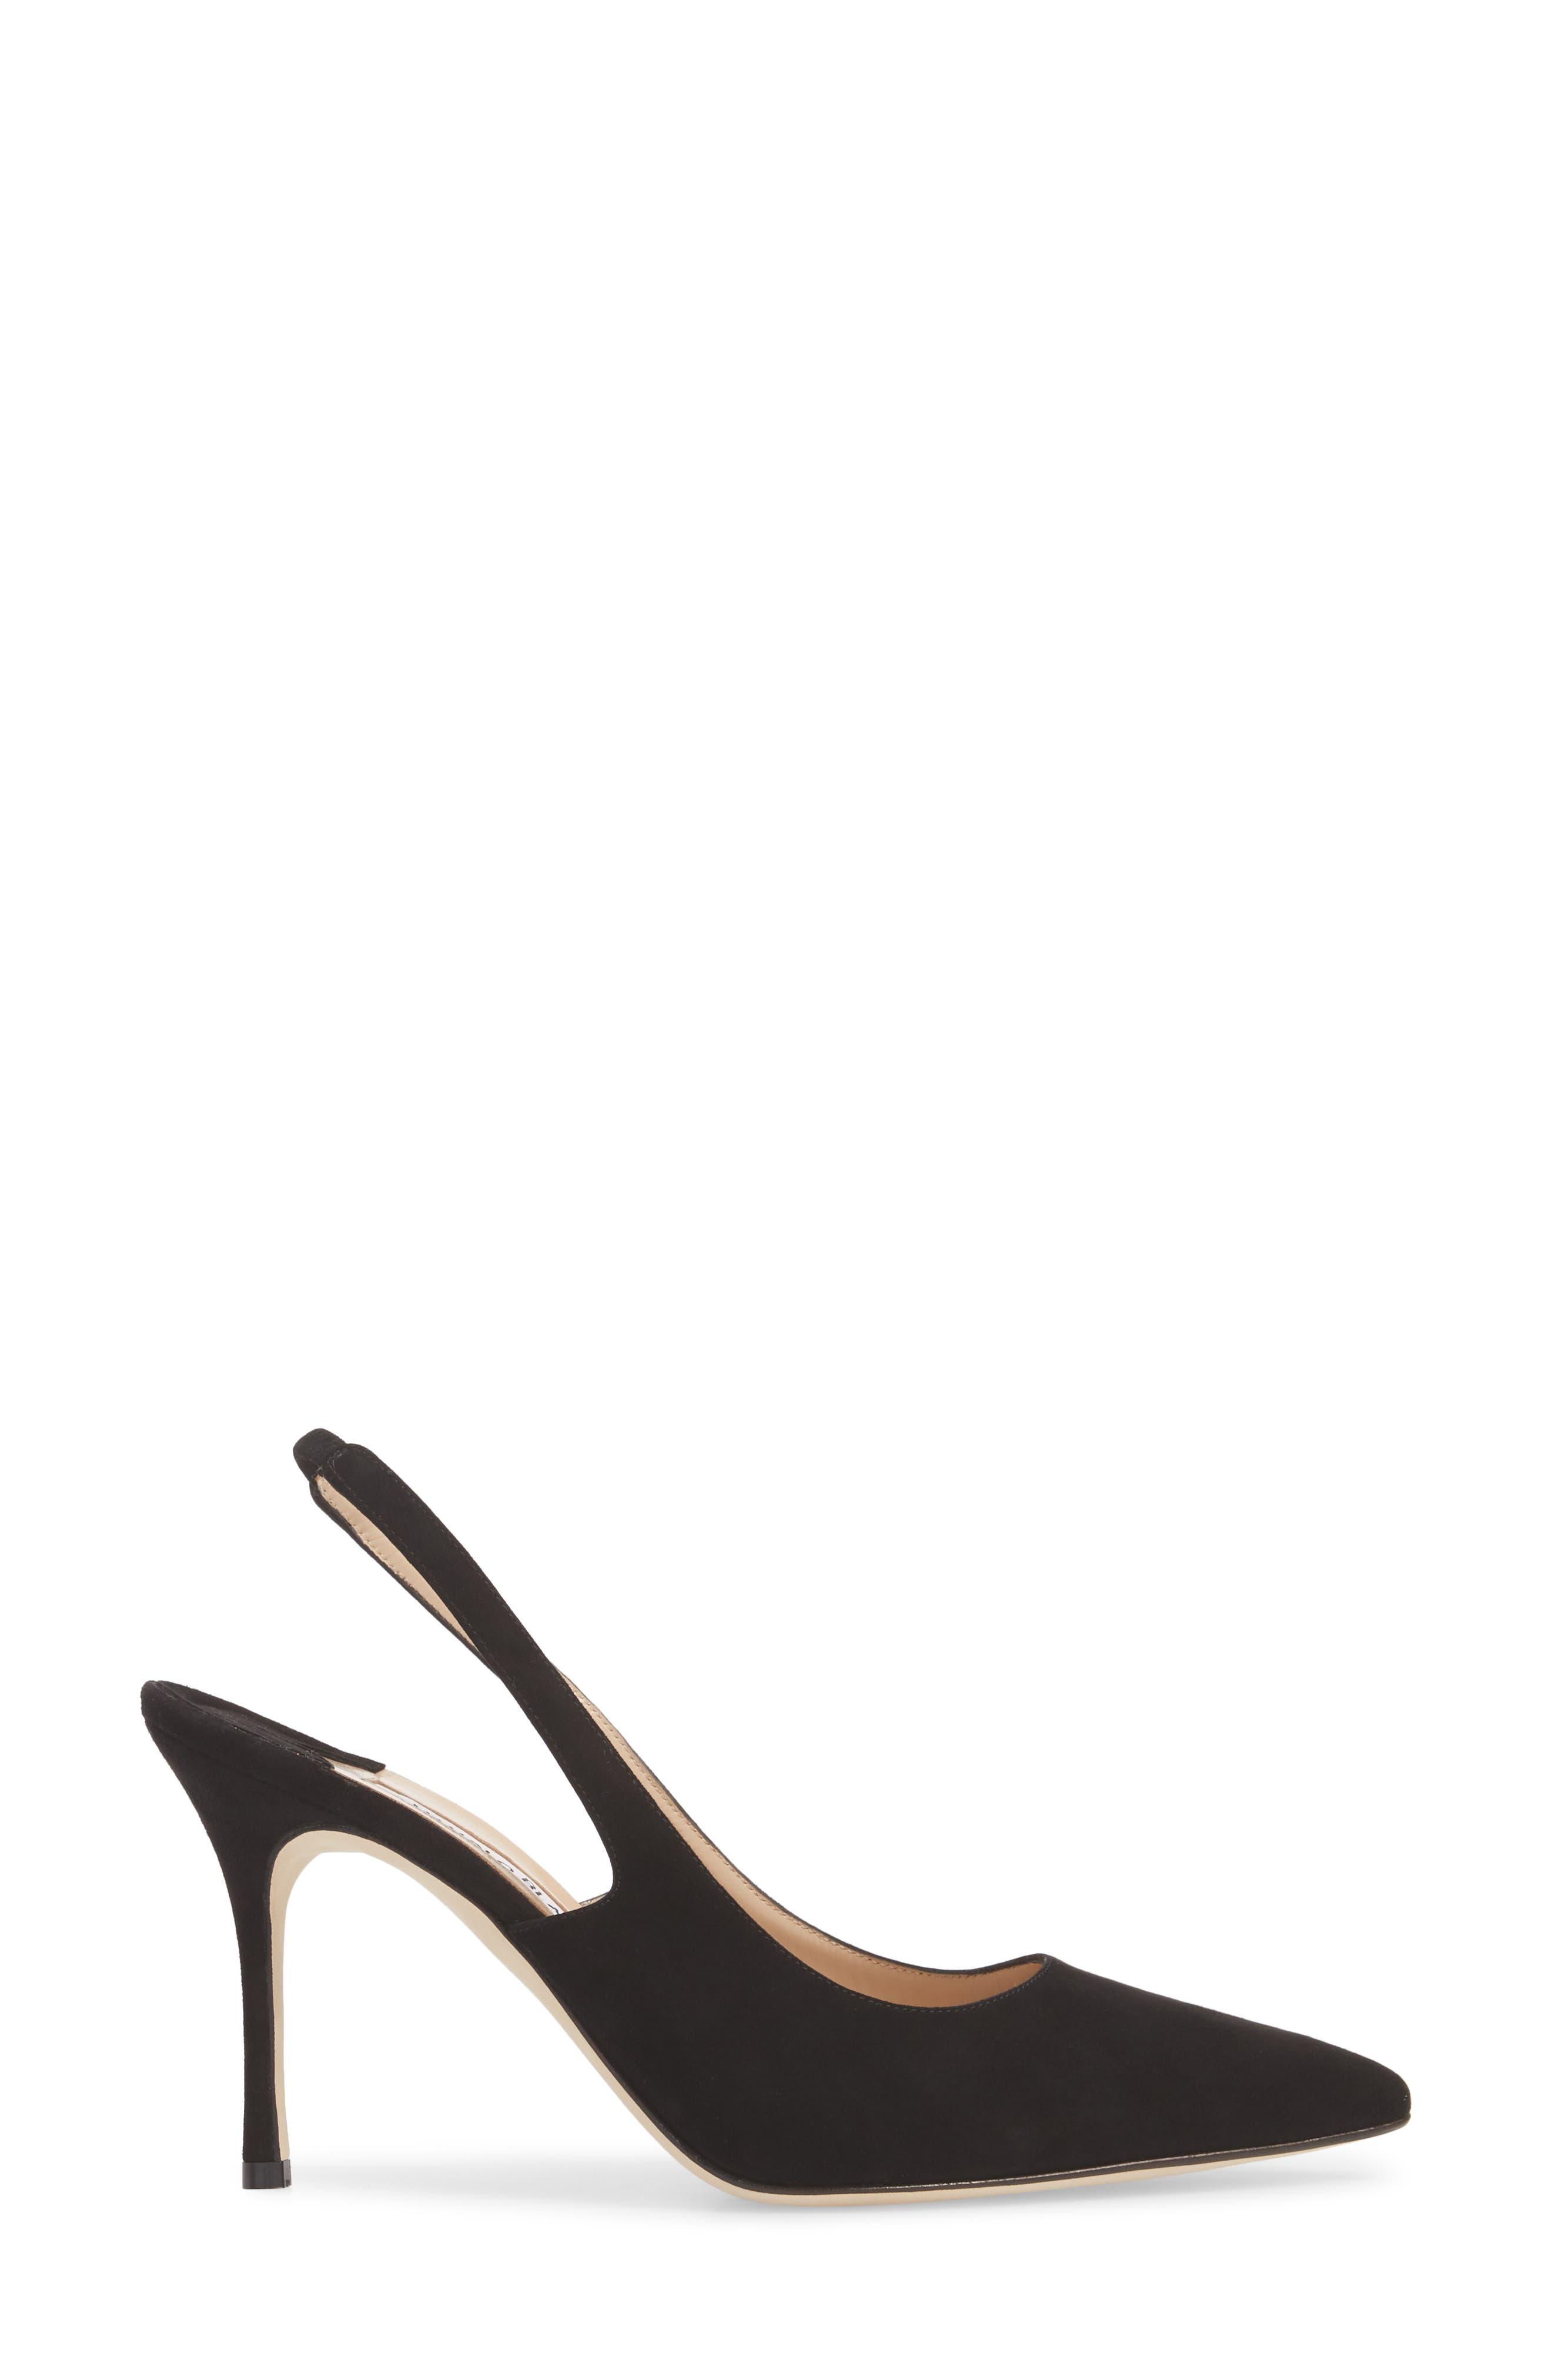 MANOLO BLAHNIK, Allura Slingback Pointy Toe Pump, Alternate thumbnail 3, color, BLACK SUEDE